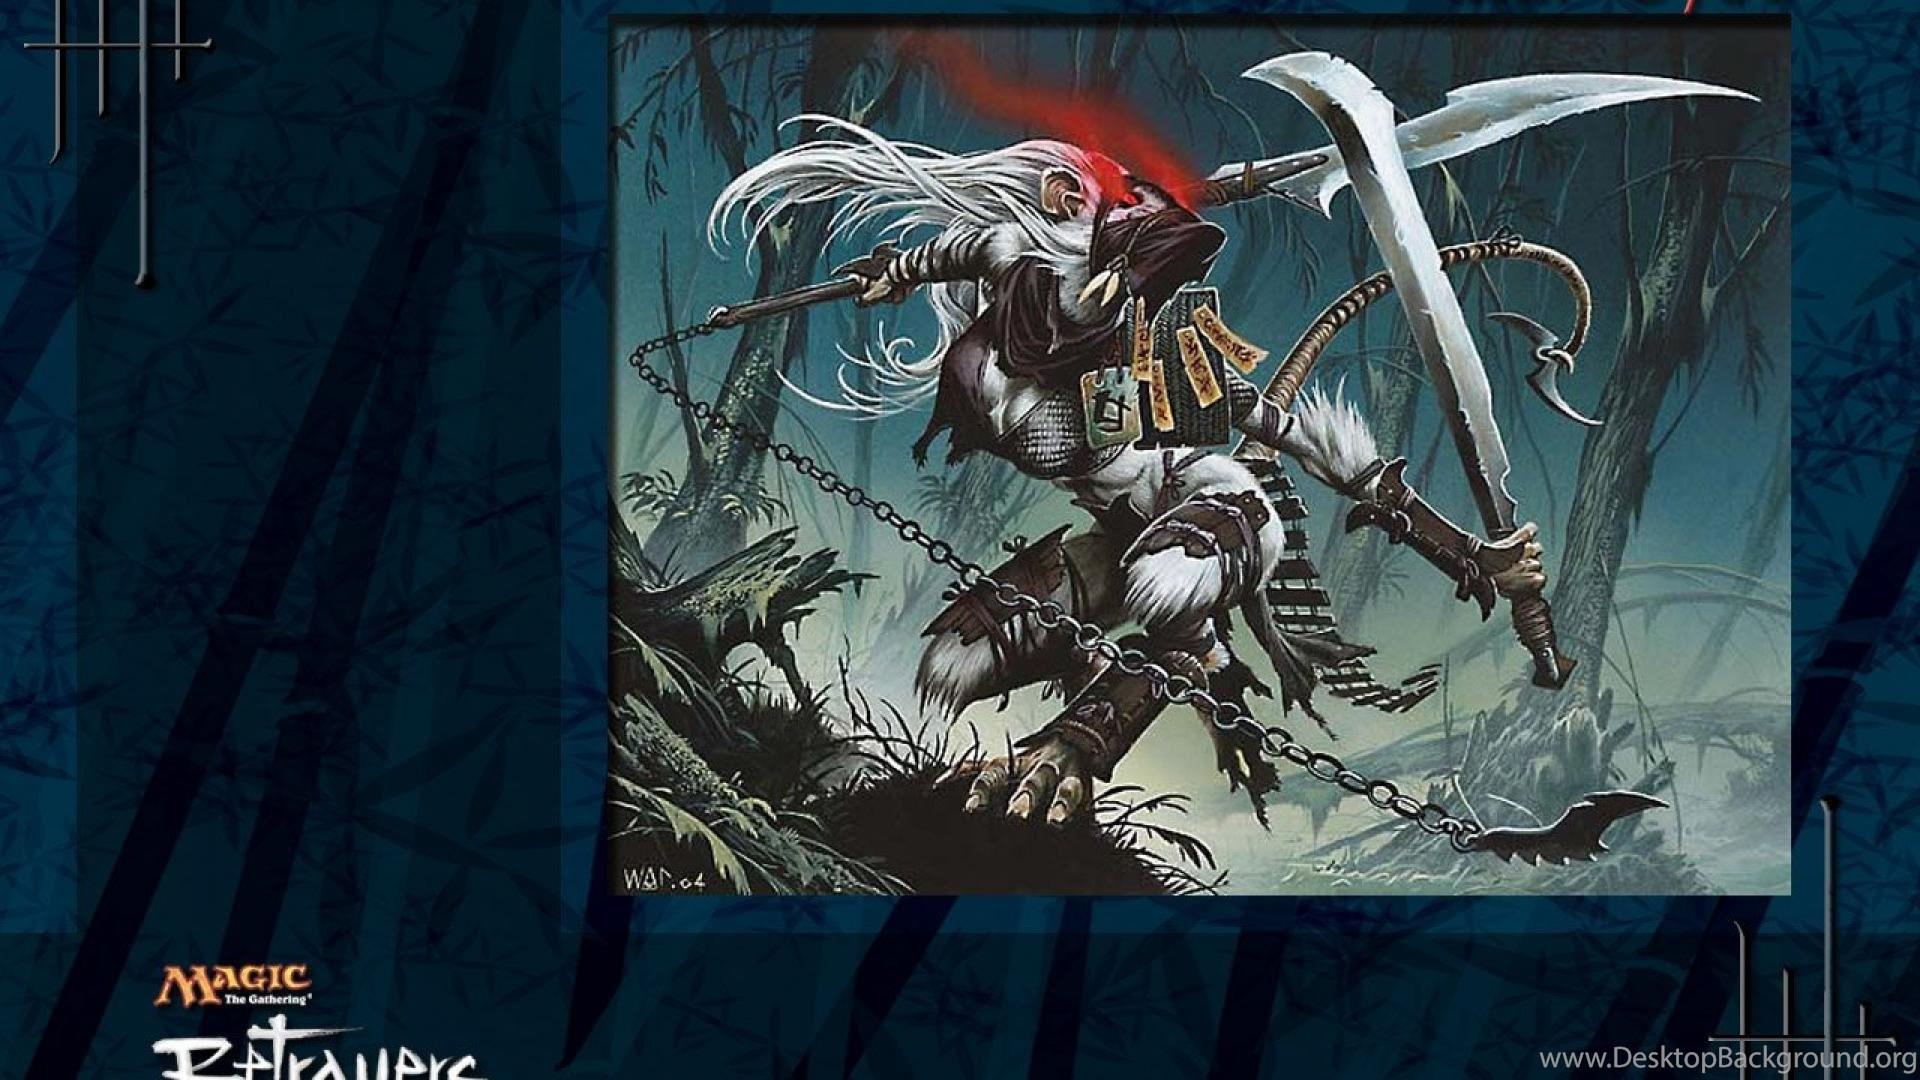 Magic The Gathering Mtg Betrayers Hd Wallpapers Desktop Background